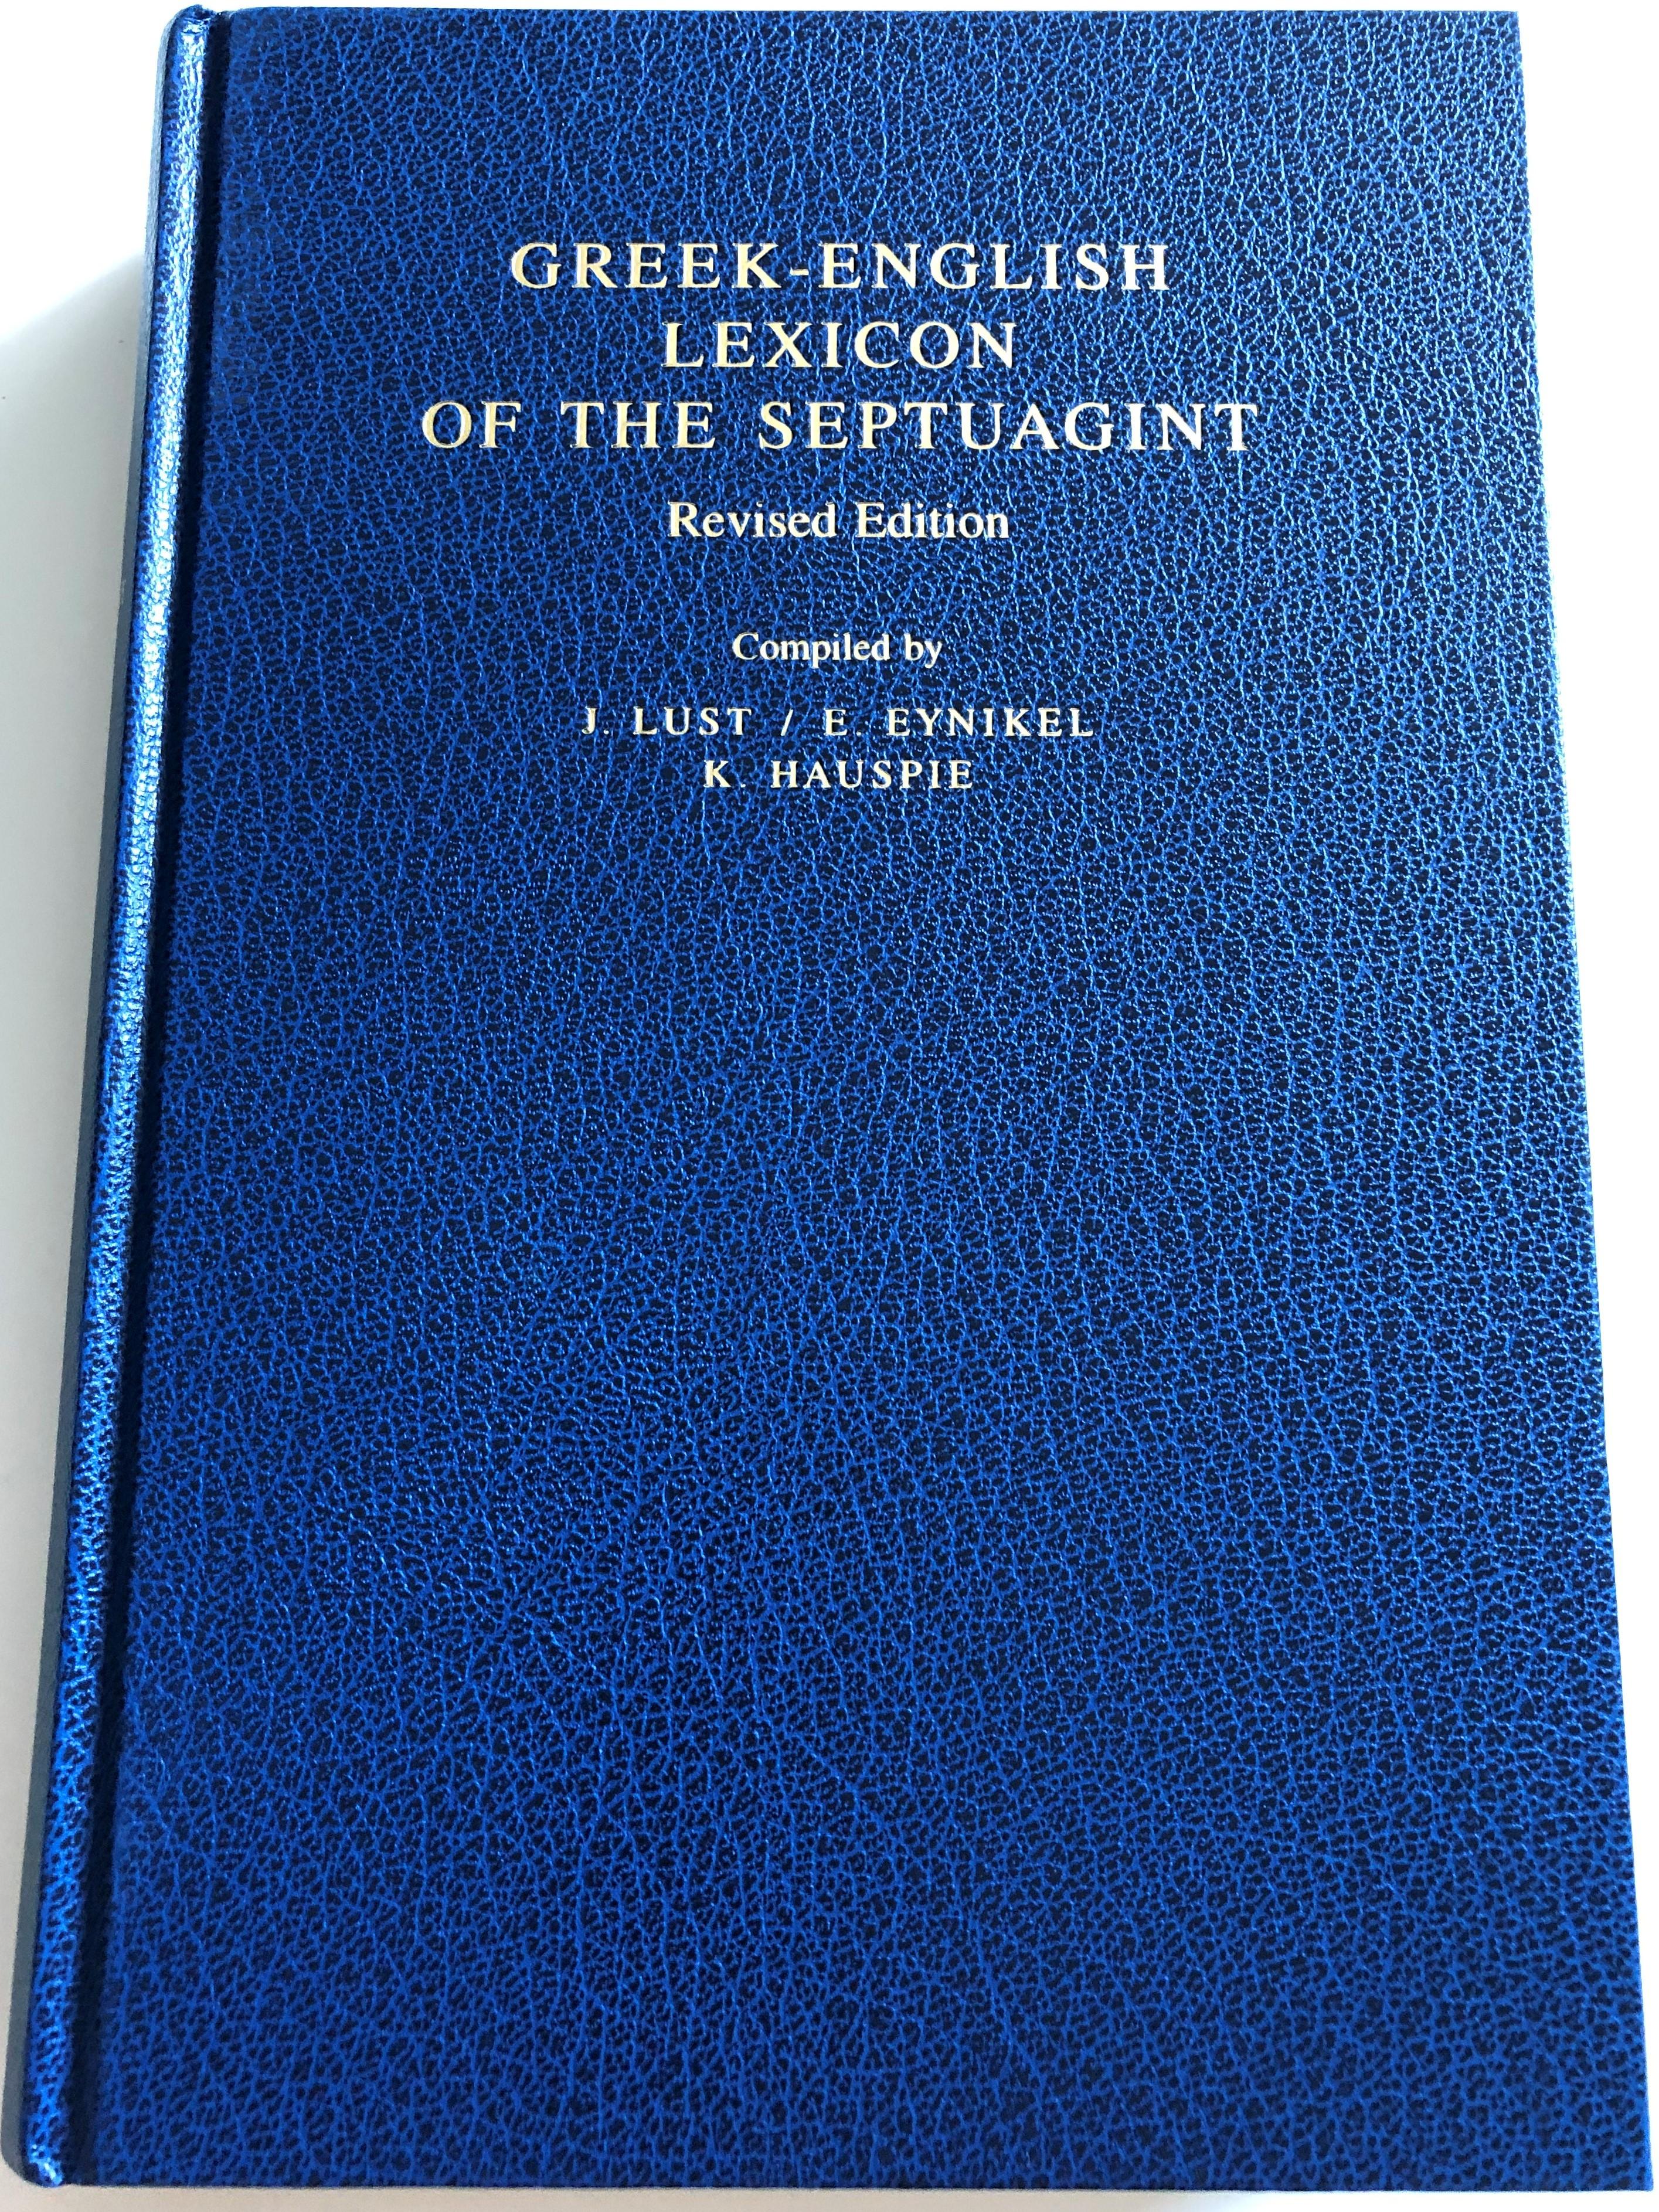 greek-english-lexicon-of-the-septuagint-revised-edition-compiled-by-johan-lust-erik-eynikel-katrin-hauspie-deutsche-bibelgesellschaft-hardcover-2003-1-.jpg